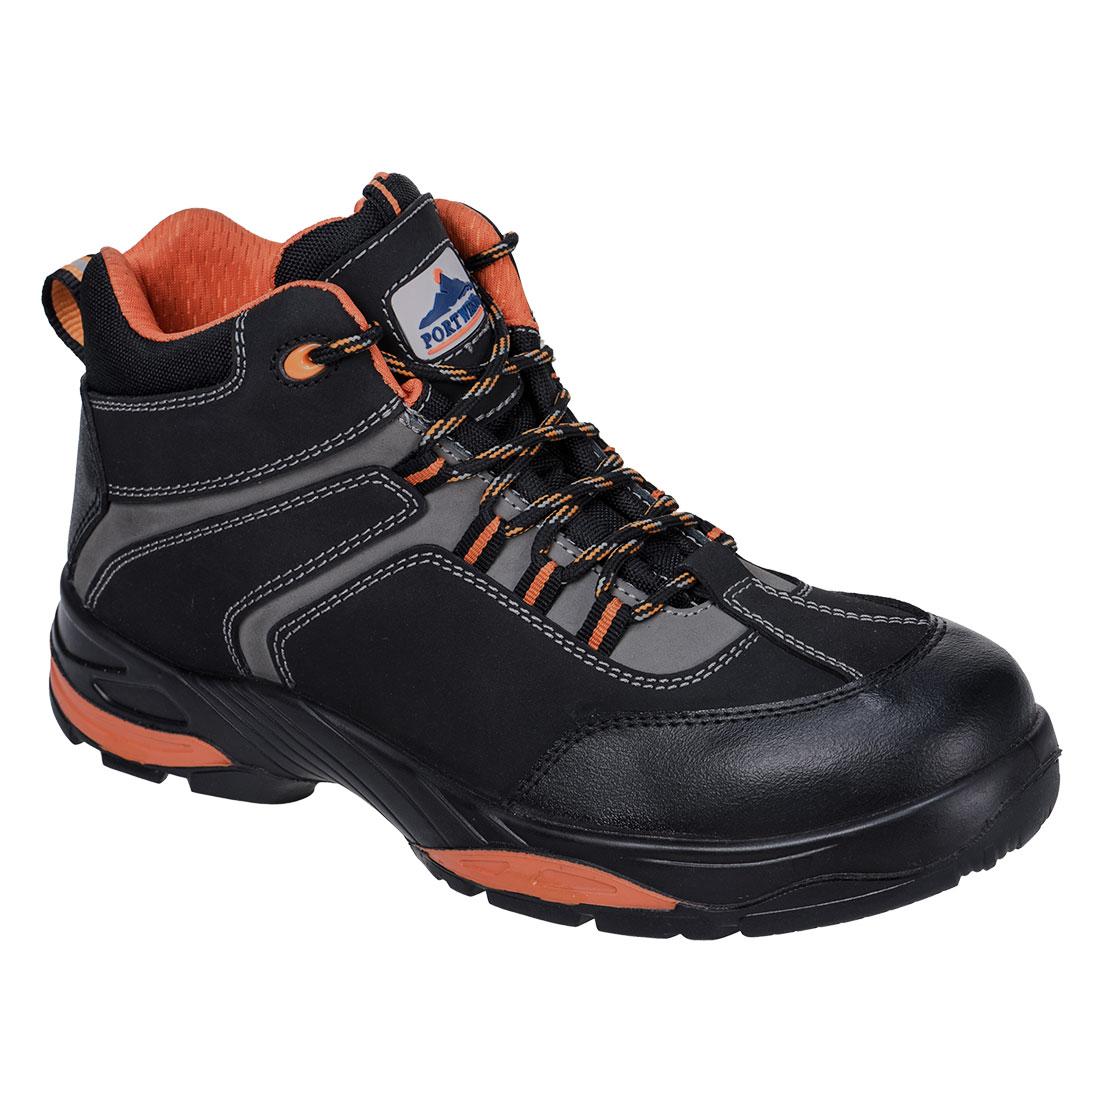 Compositelite Operis Boot, Black      Size 5 R/Fit